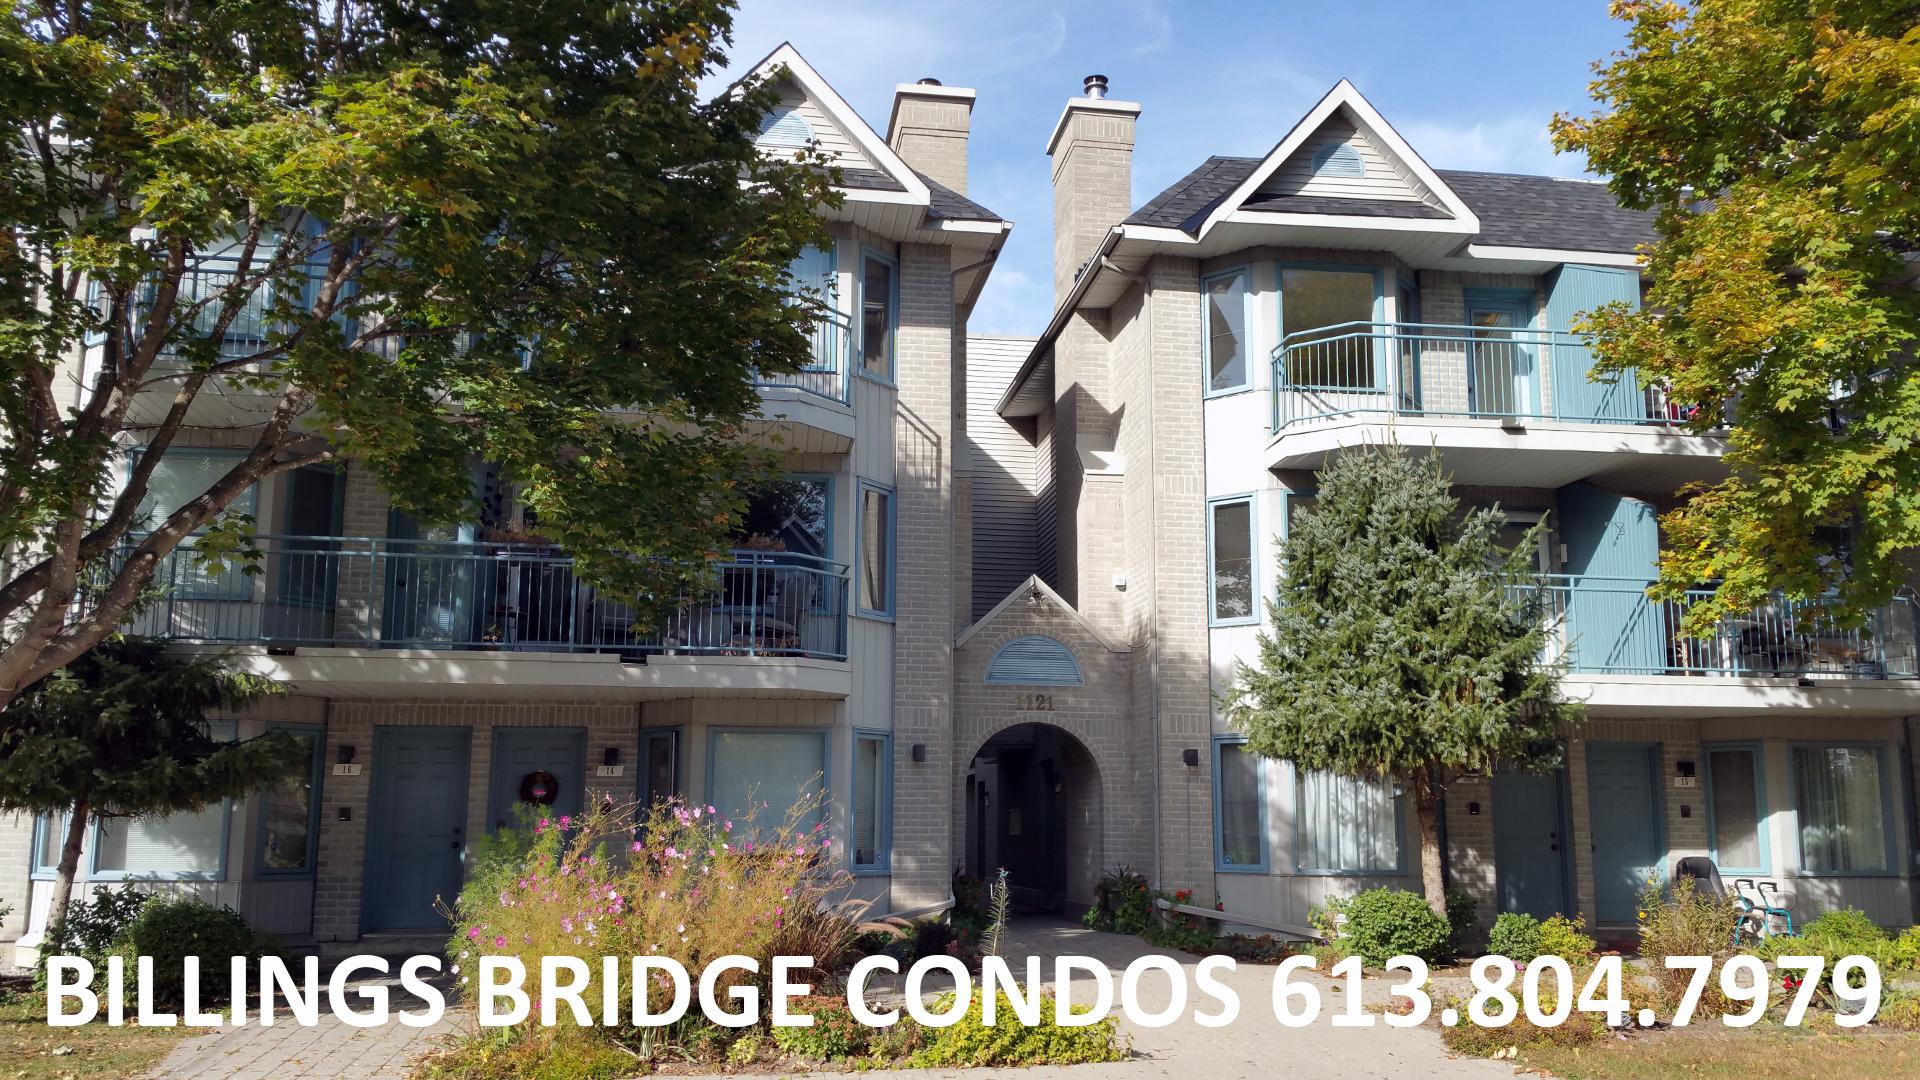 Ottawa Condos For Sale Billings Bridge 1121 Bavlie Avenue